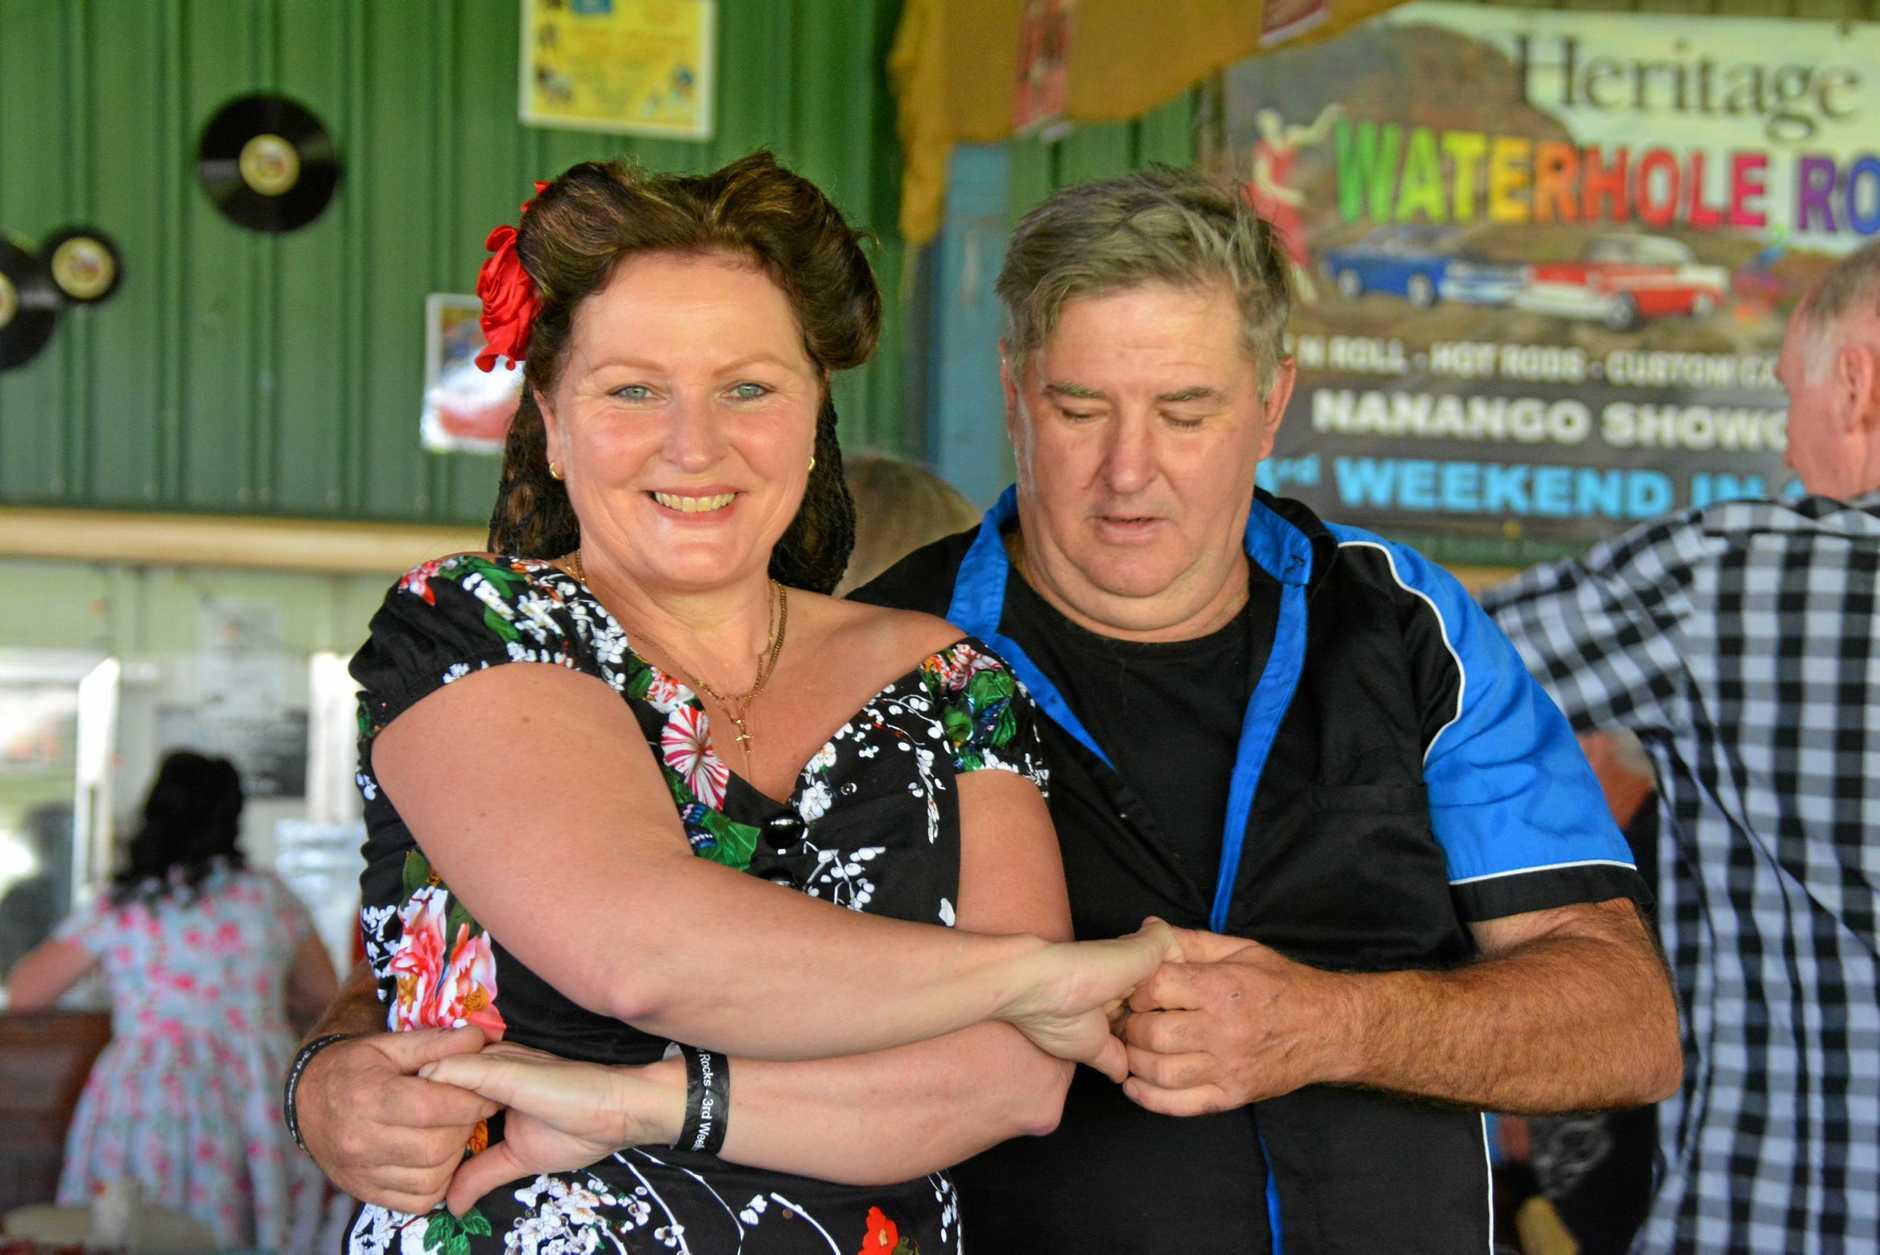 DANCE: Gillian Williams and Gordan Boatfield dance along to the rock 'n' roll music at the Waterhole Rocks festival in Nanango.